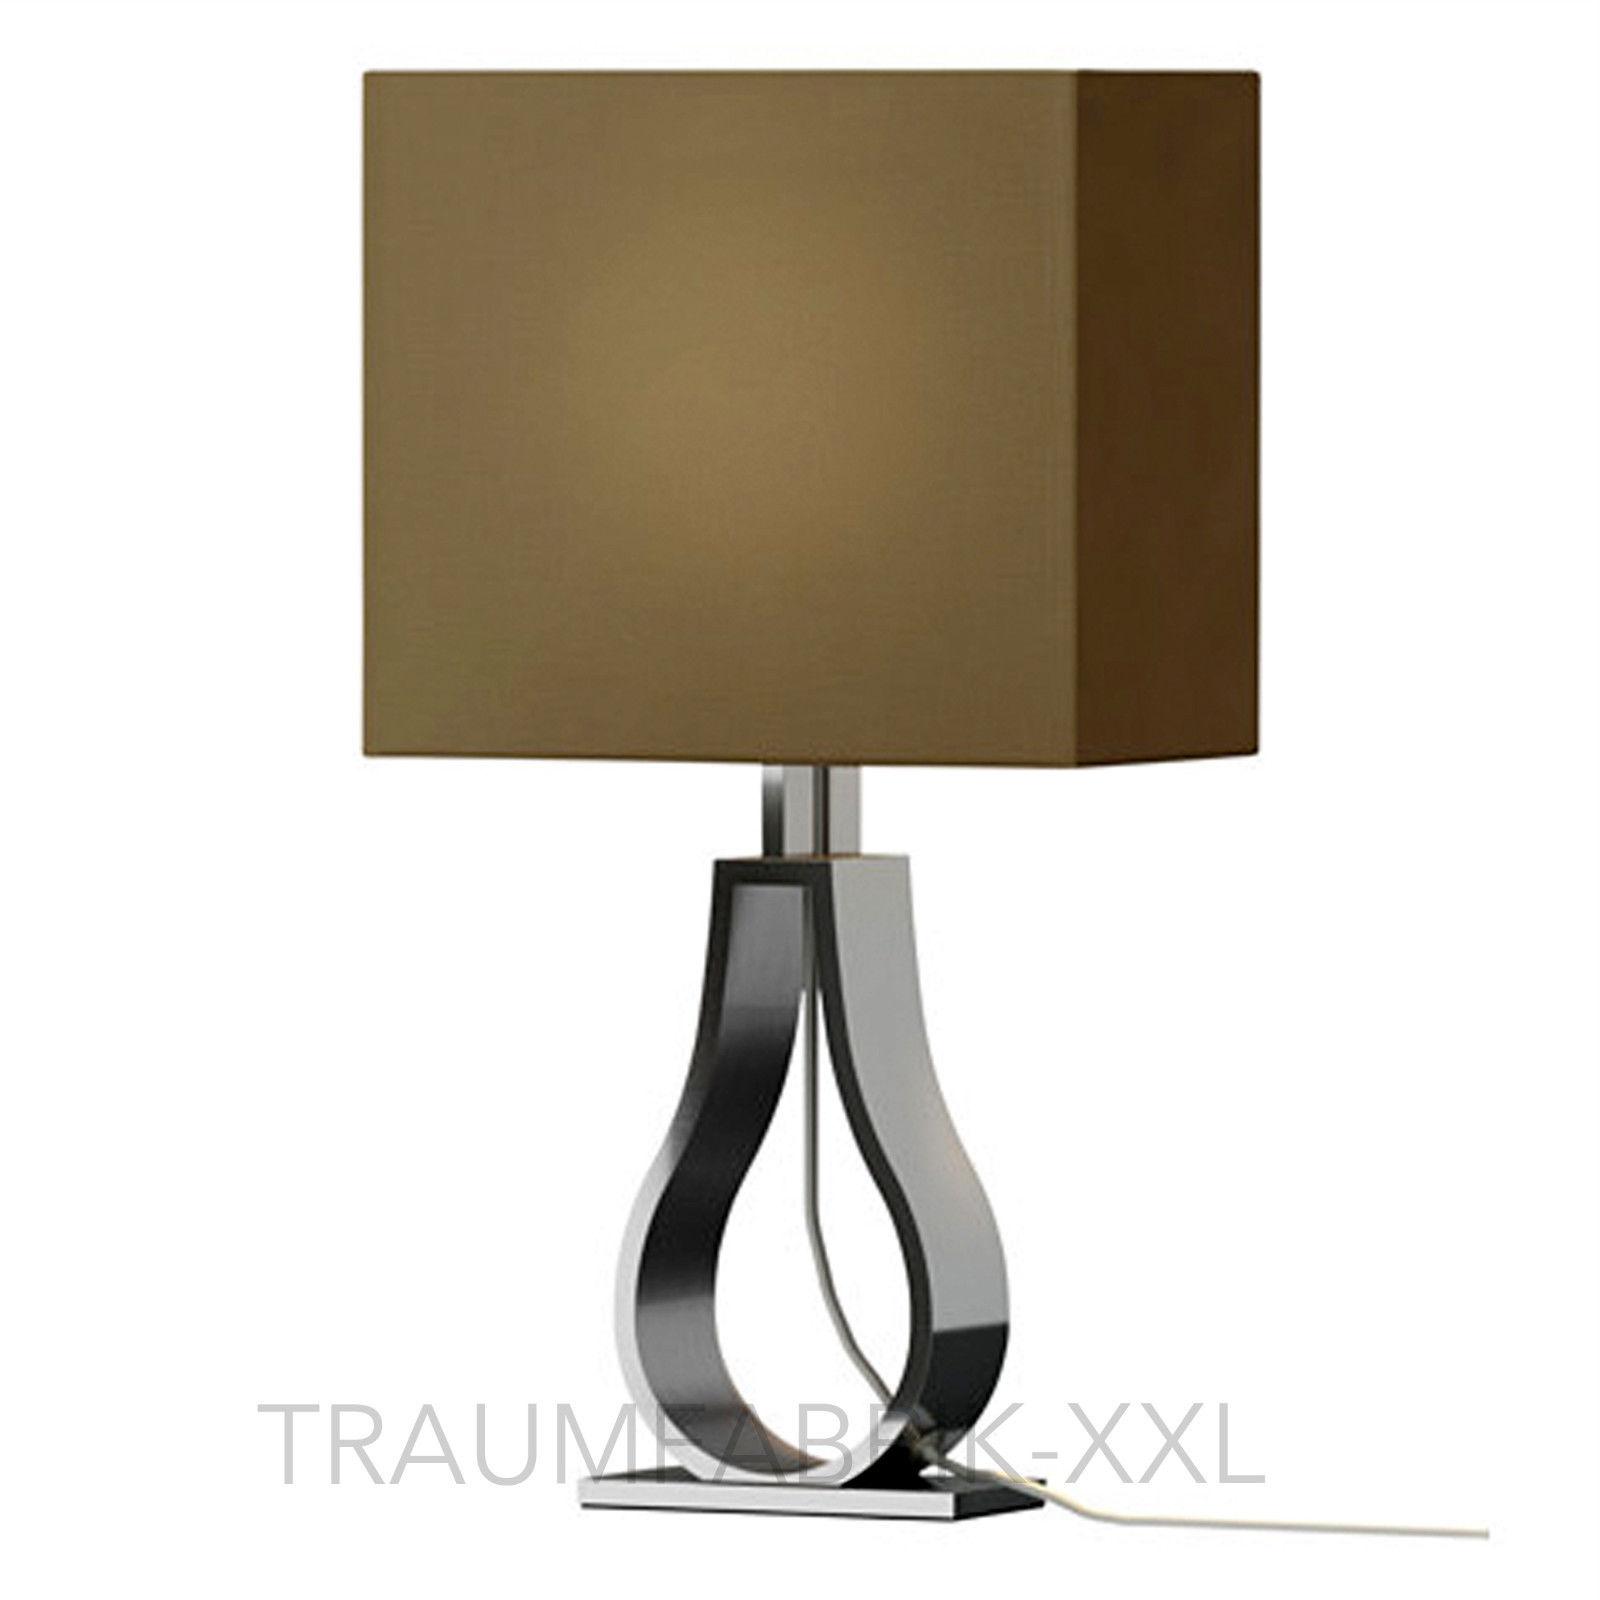 ikea nachttischlampe swalif. Black Bedroom Furniture Sets. Home Design Ideas